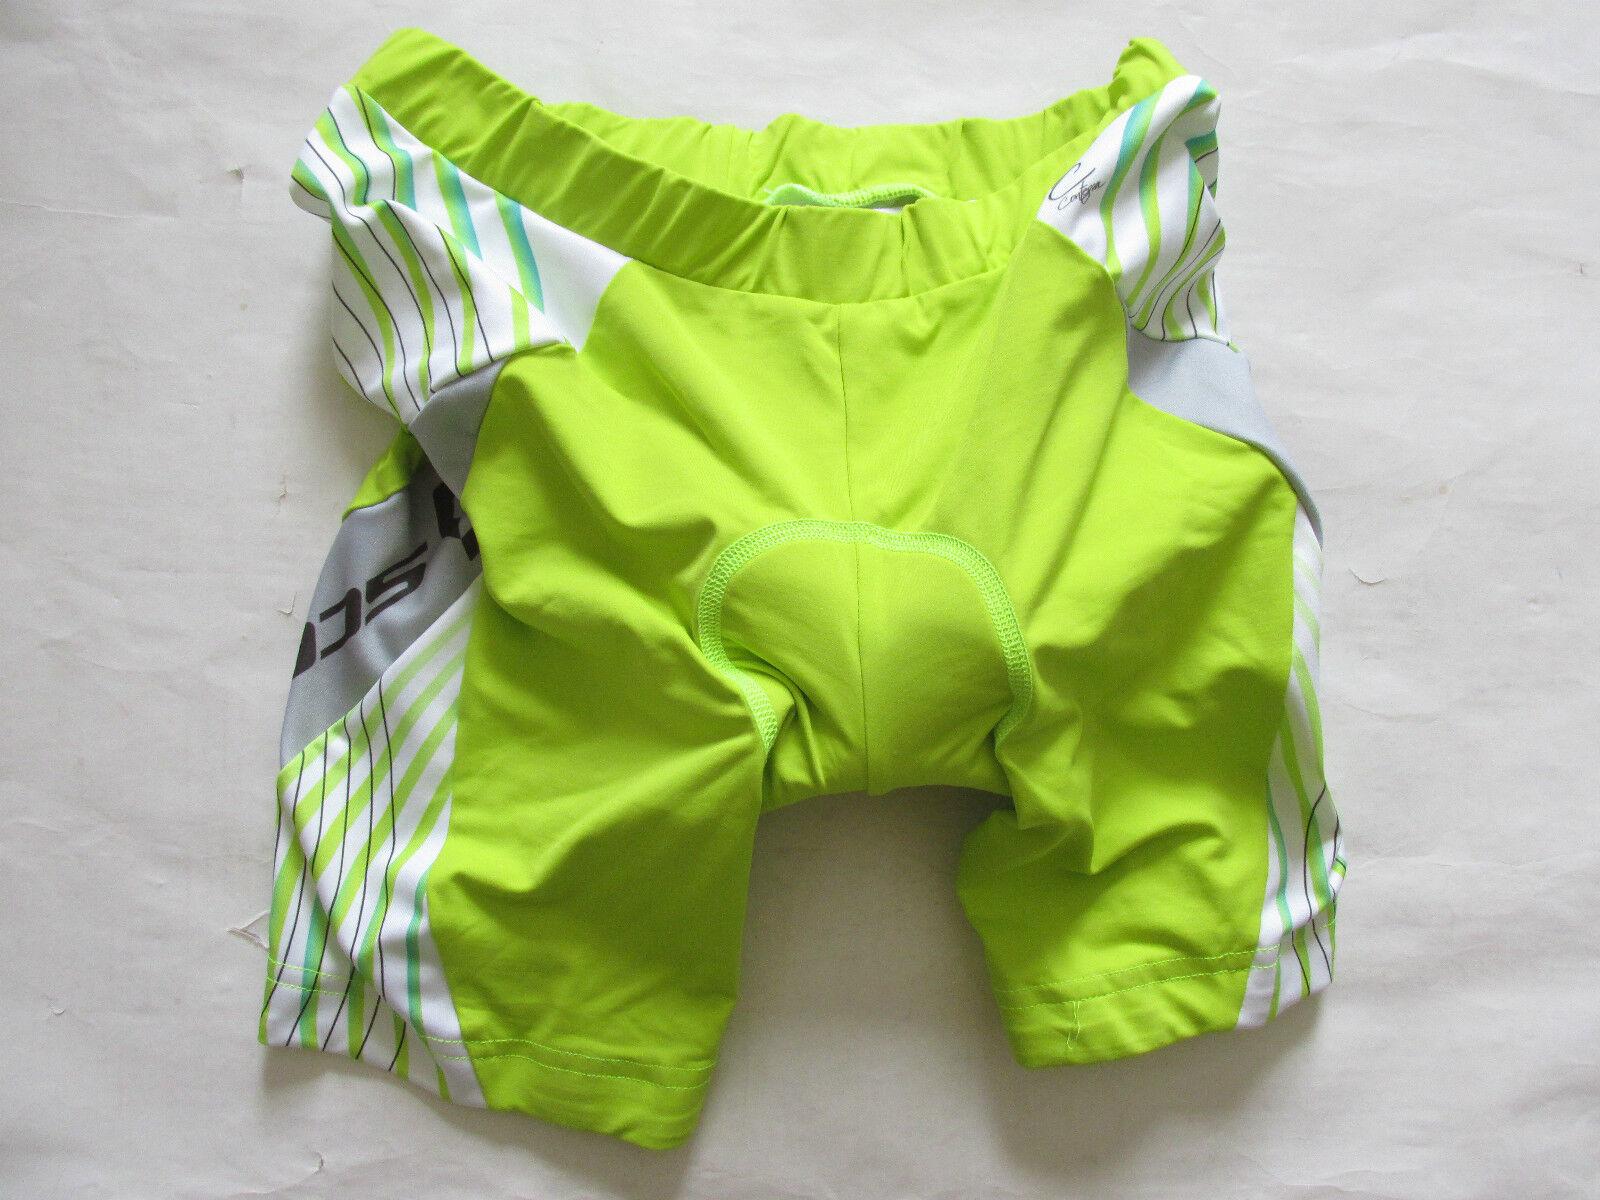 Scott Ropa Ciclismo Mujer Sombra Carreras Pantalones Cortos 221609288100